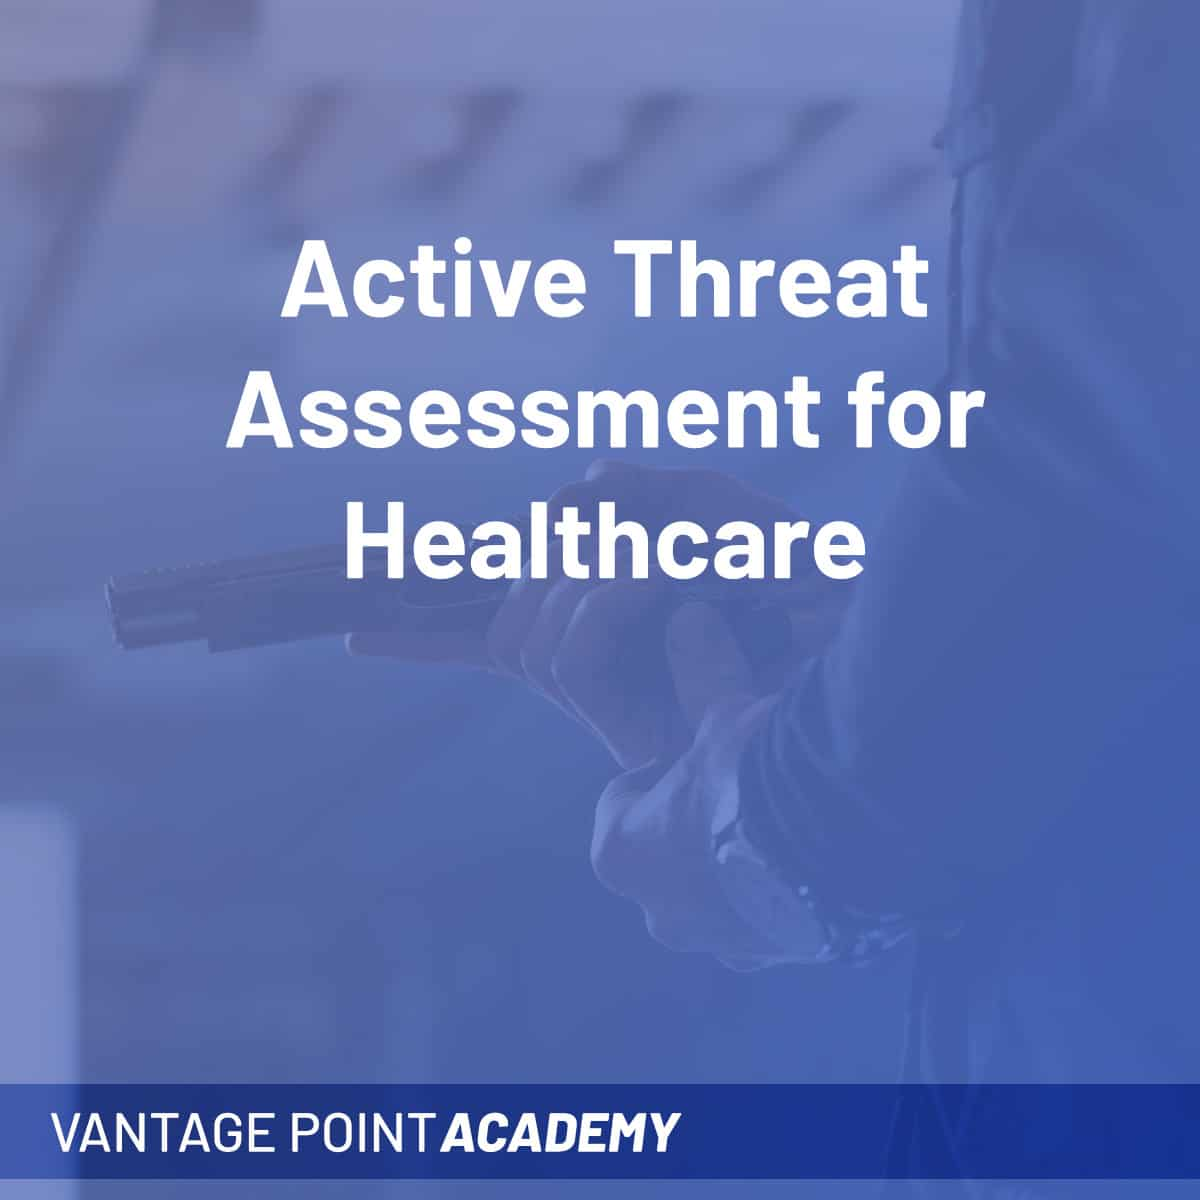 Active Threat Training